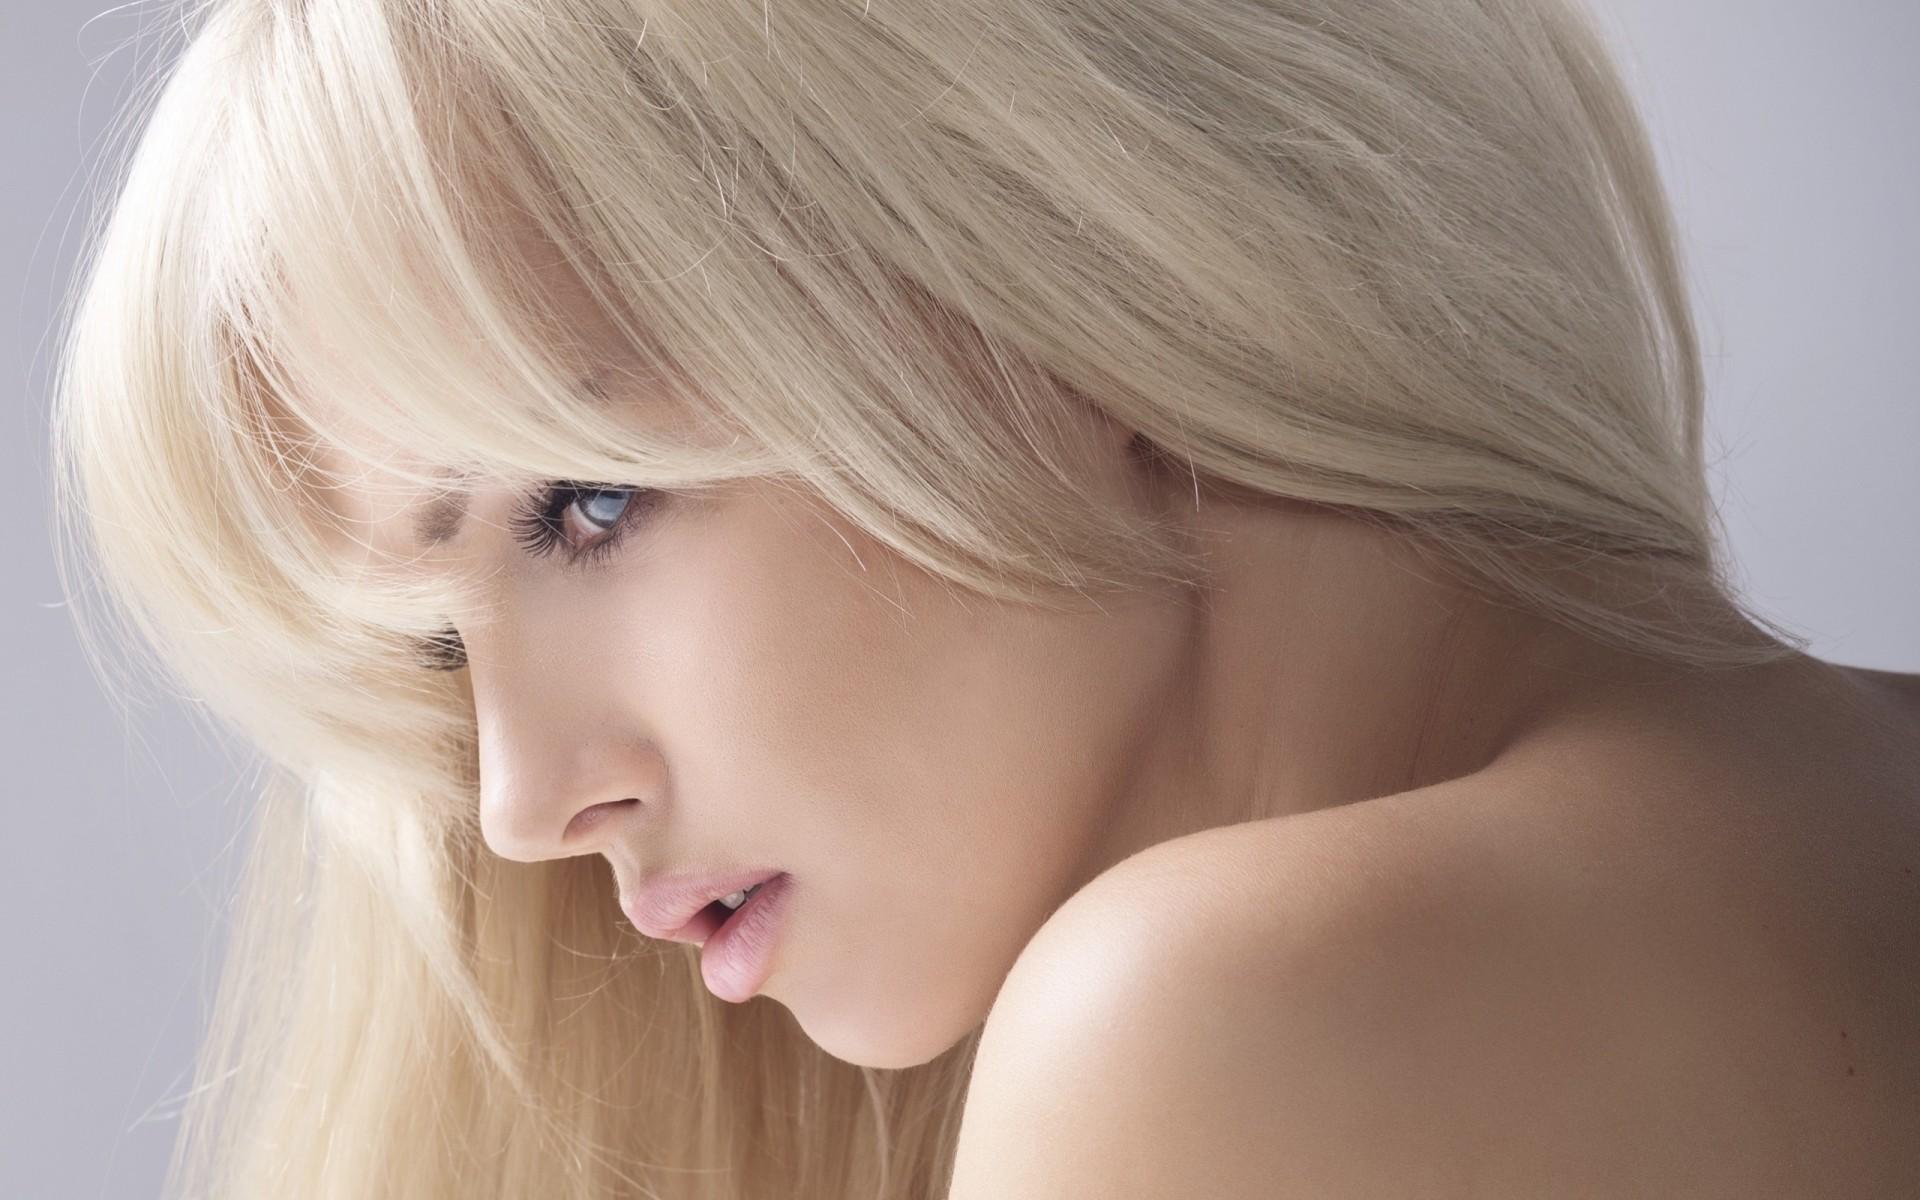 Фото блондинок в домашних условиях на аву с короткими волосами